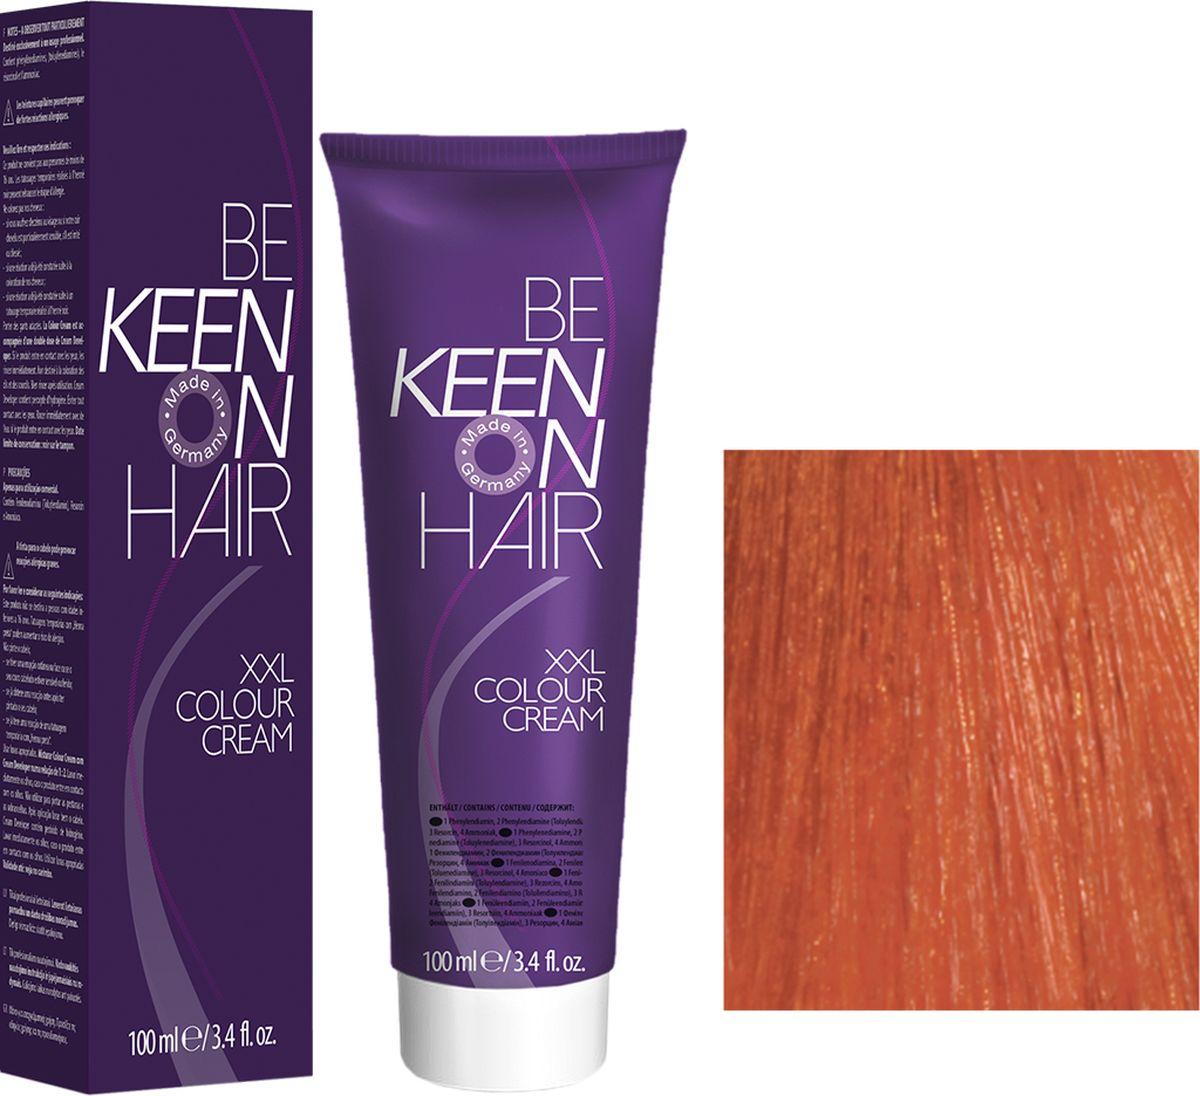 Keen Краска для волос 7.44 Натуральный интенсивно-медный блондин Mittelblond Kupfer-Intensiv, 100 мл